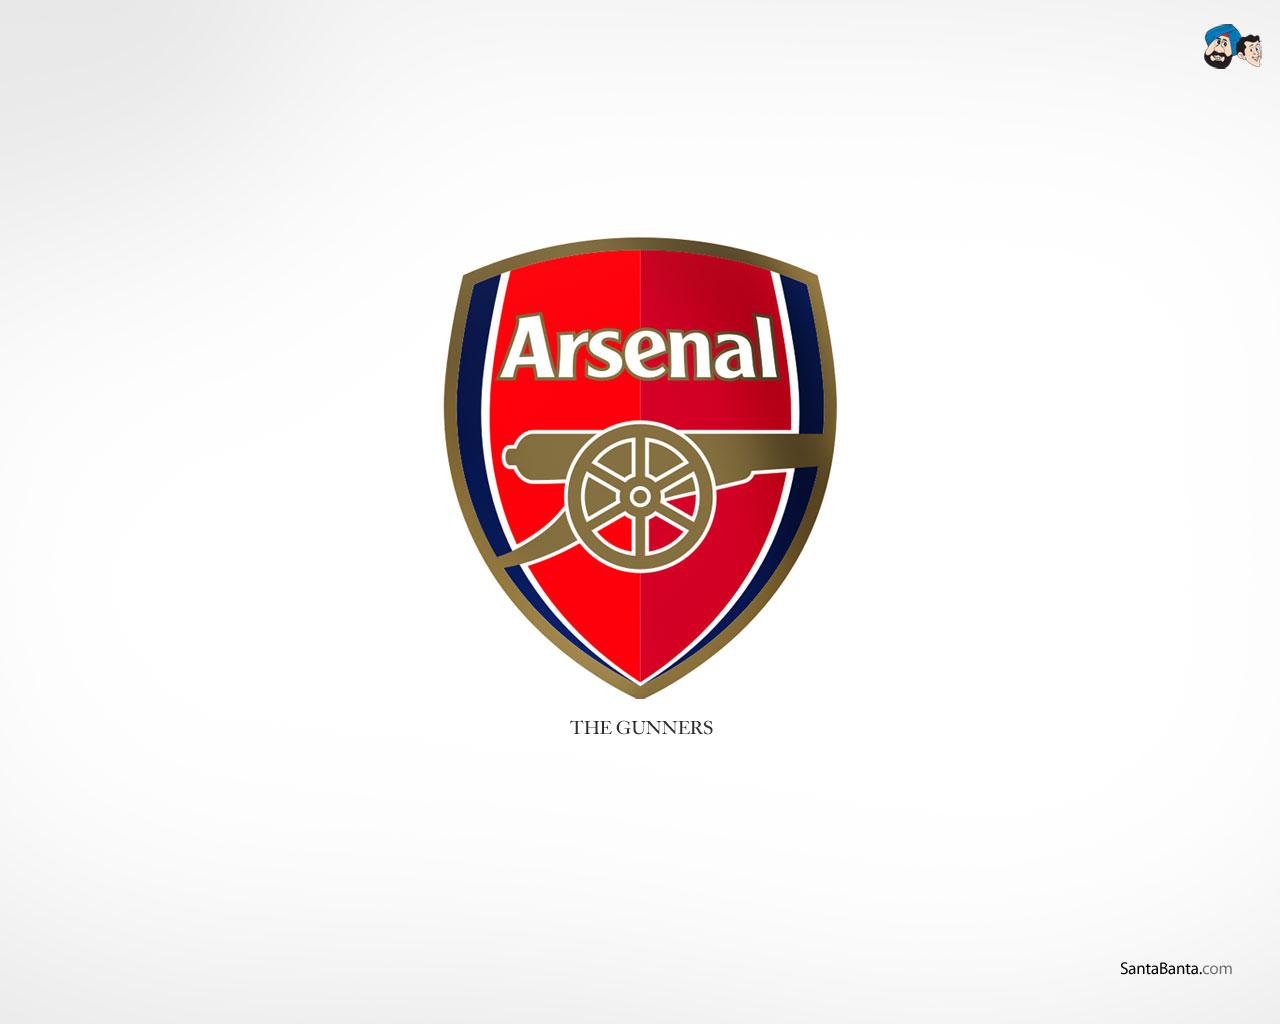 Wallpapers Hd For Mac: Arsenal Football Club Logo Wallpaper HD